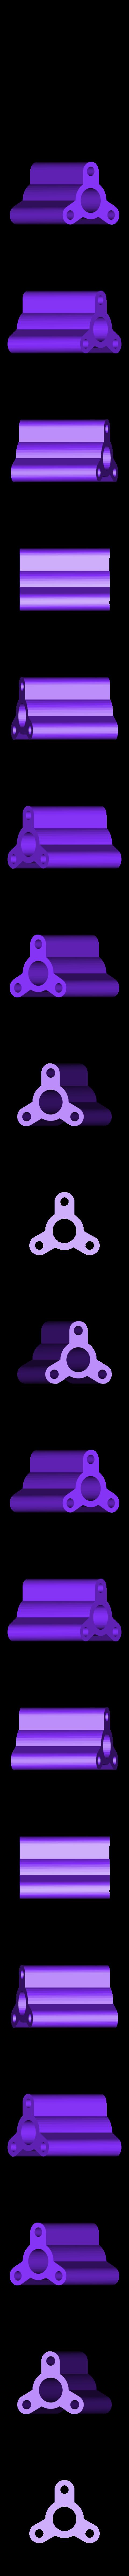 D52mm x L60mm Spool adapter A.STL Download STL file Spool Holder Hub Adapters • Template to 3D print, PlanetBlue